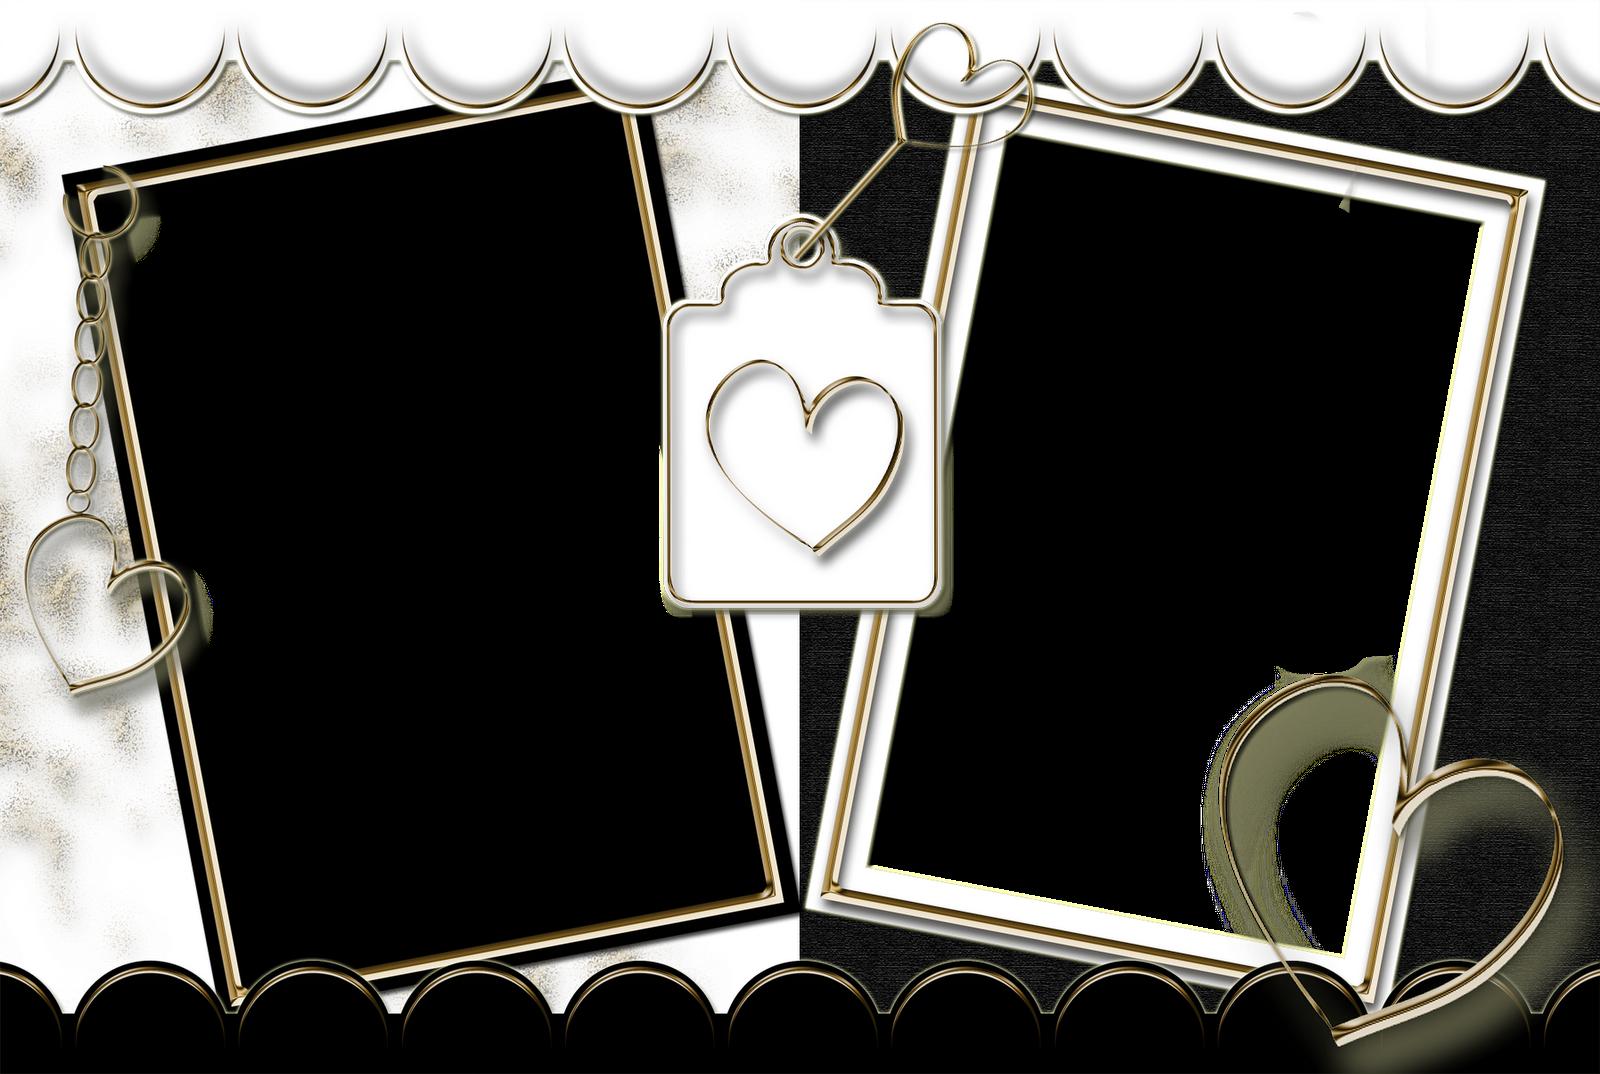 free online clip art editor